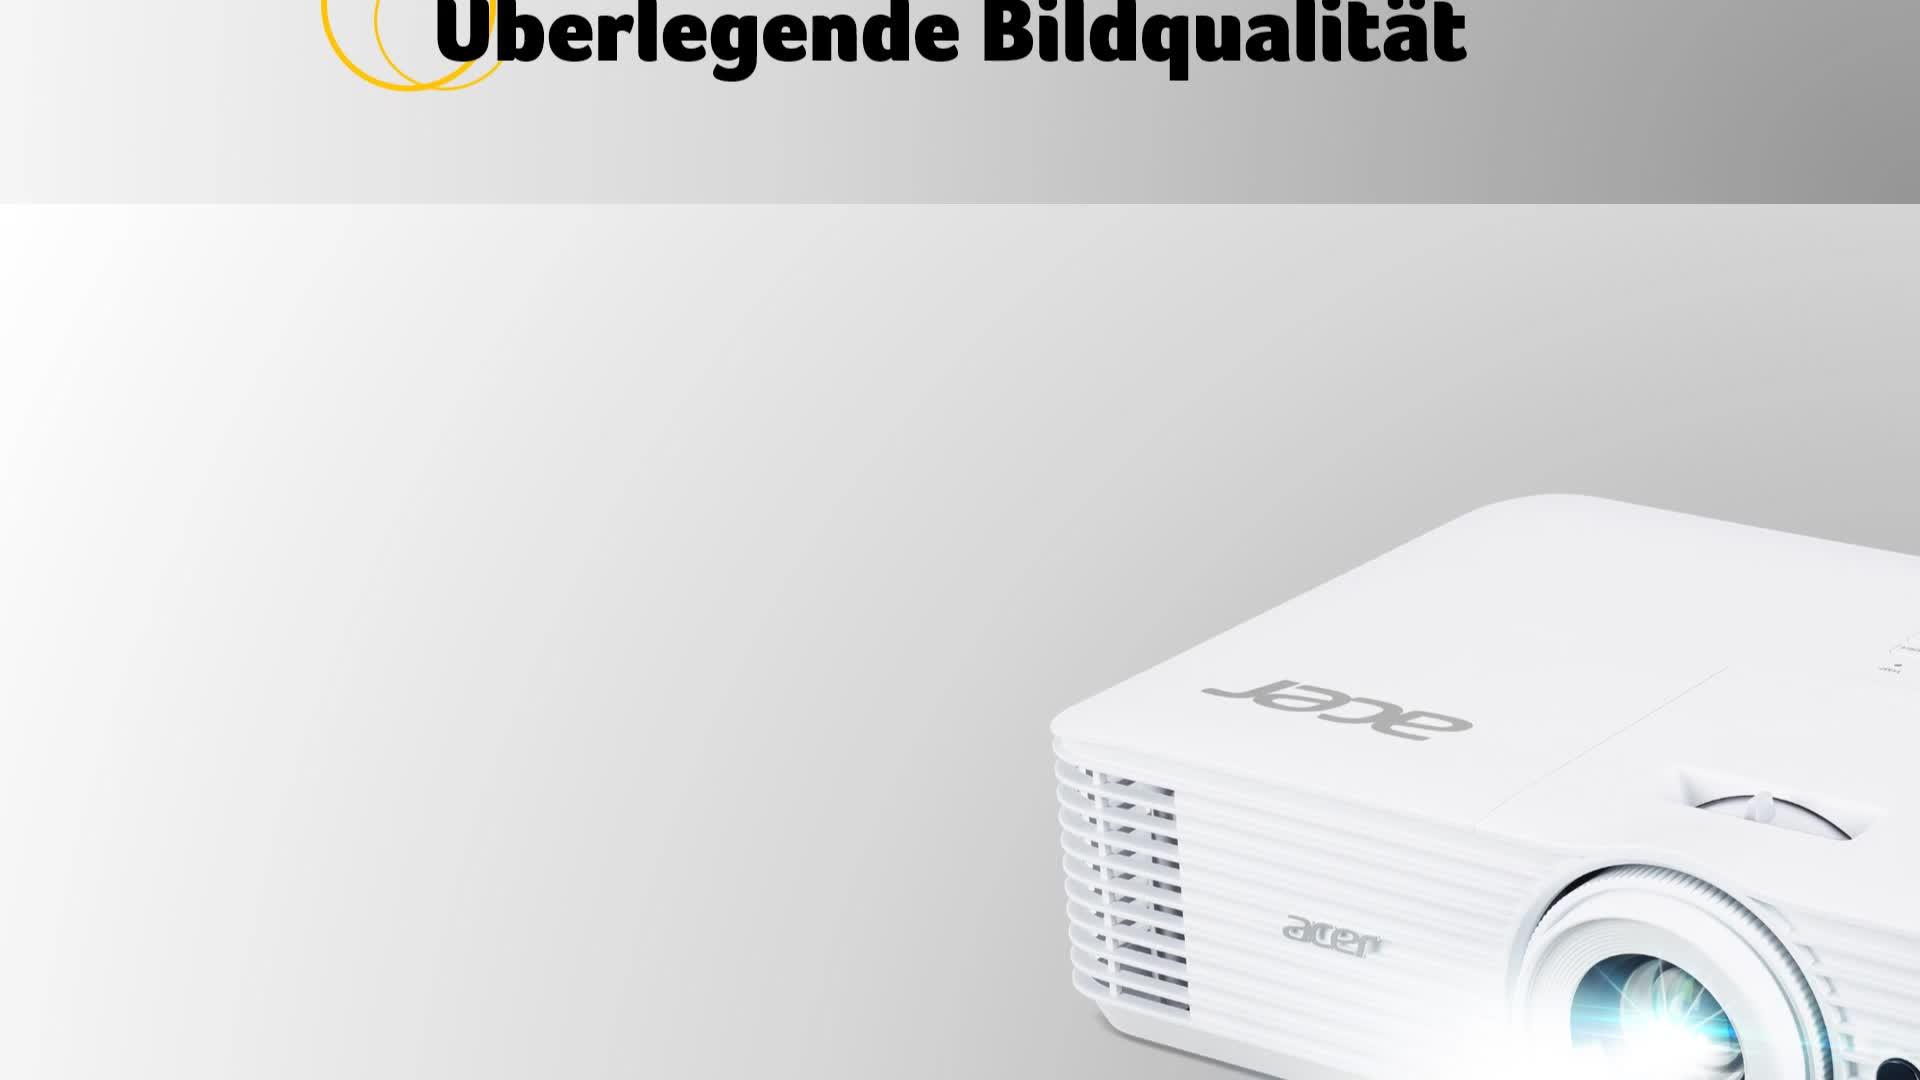 Acer H6541bd Dlp Beamer Fhd 1 920 X 1 080 Pixel 4 000 Ansi Lumen 10 000 1 Kontrast 3d Keystone Lautsprecher Hdmi Hdcp Vga Audio Heimkino Heimkino Tv Video